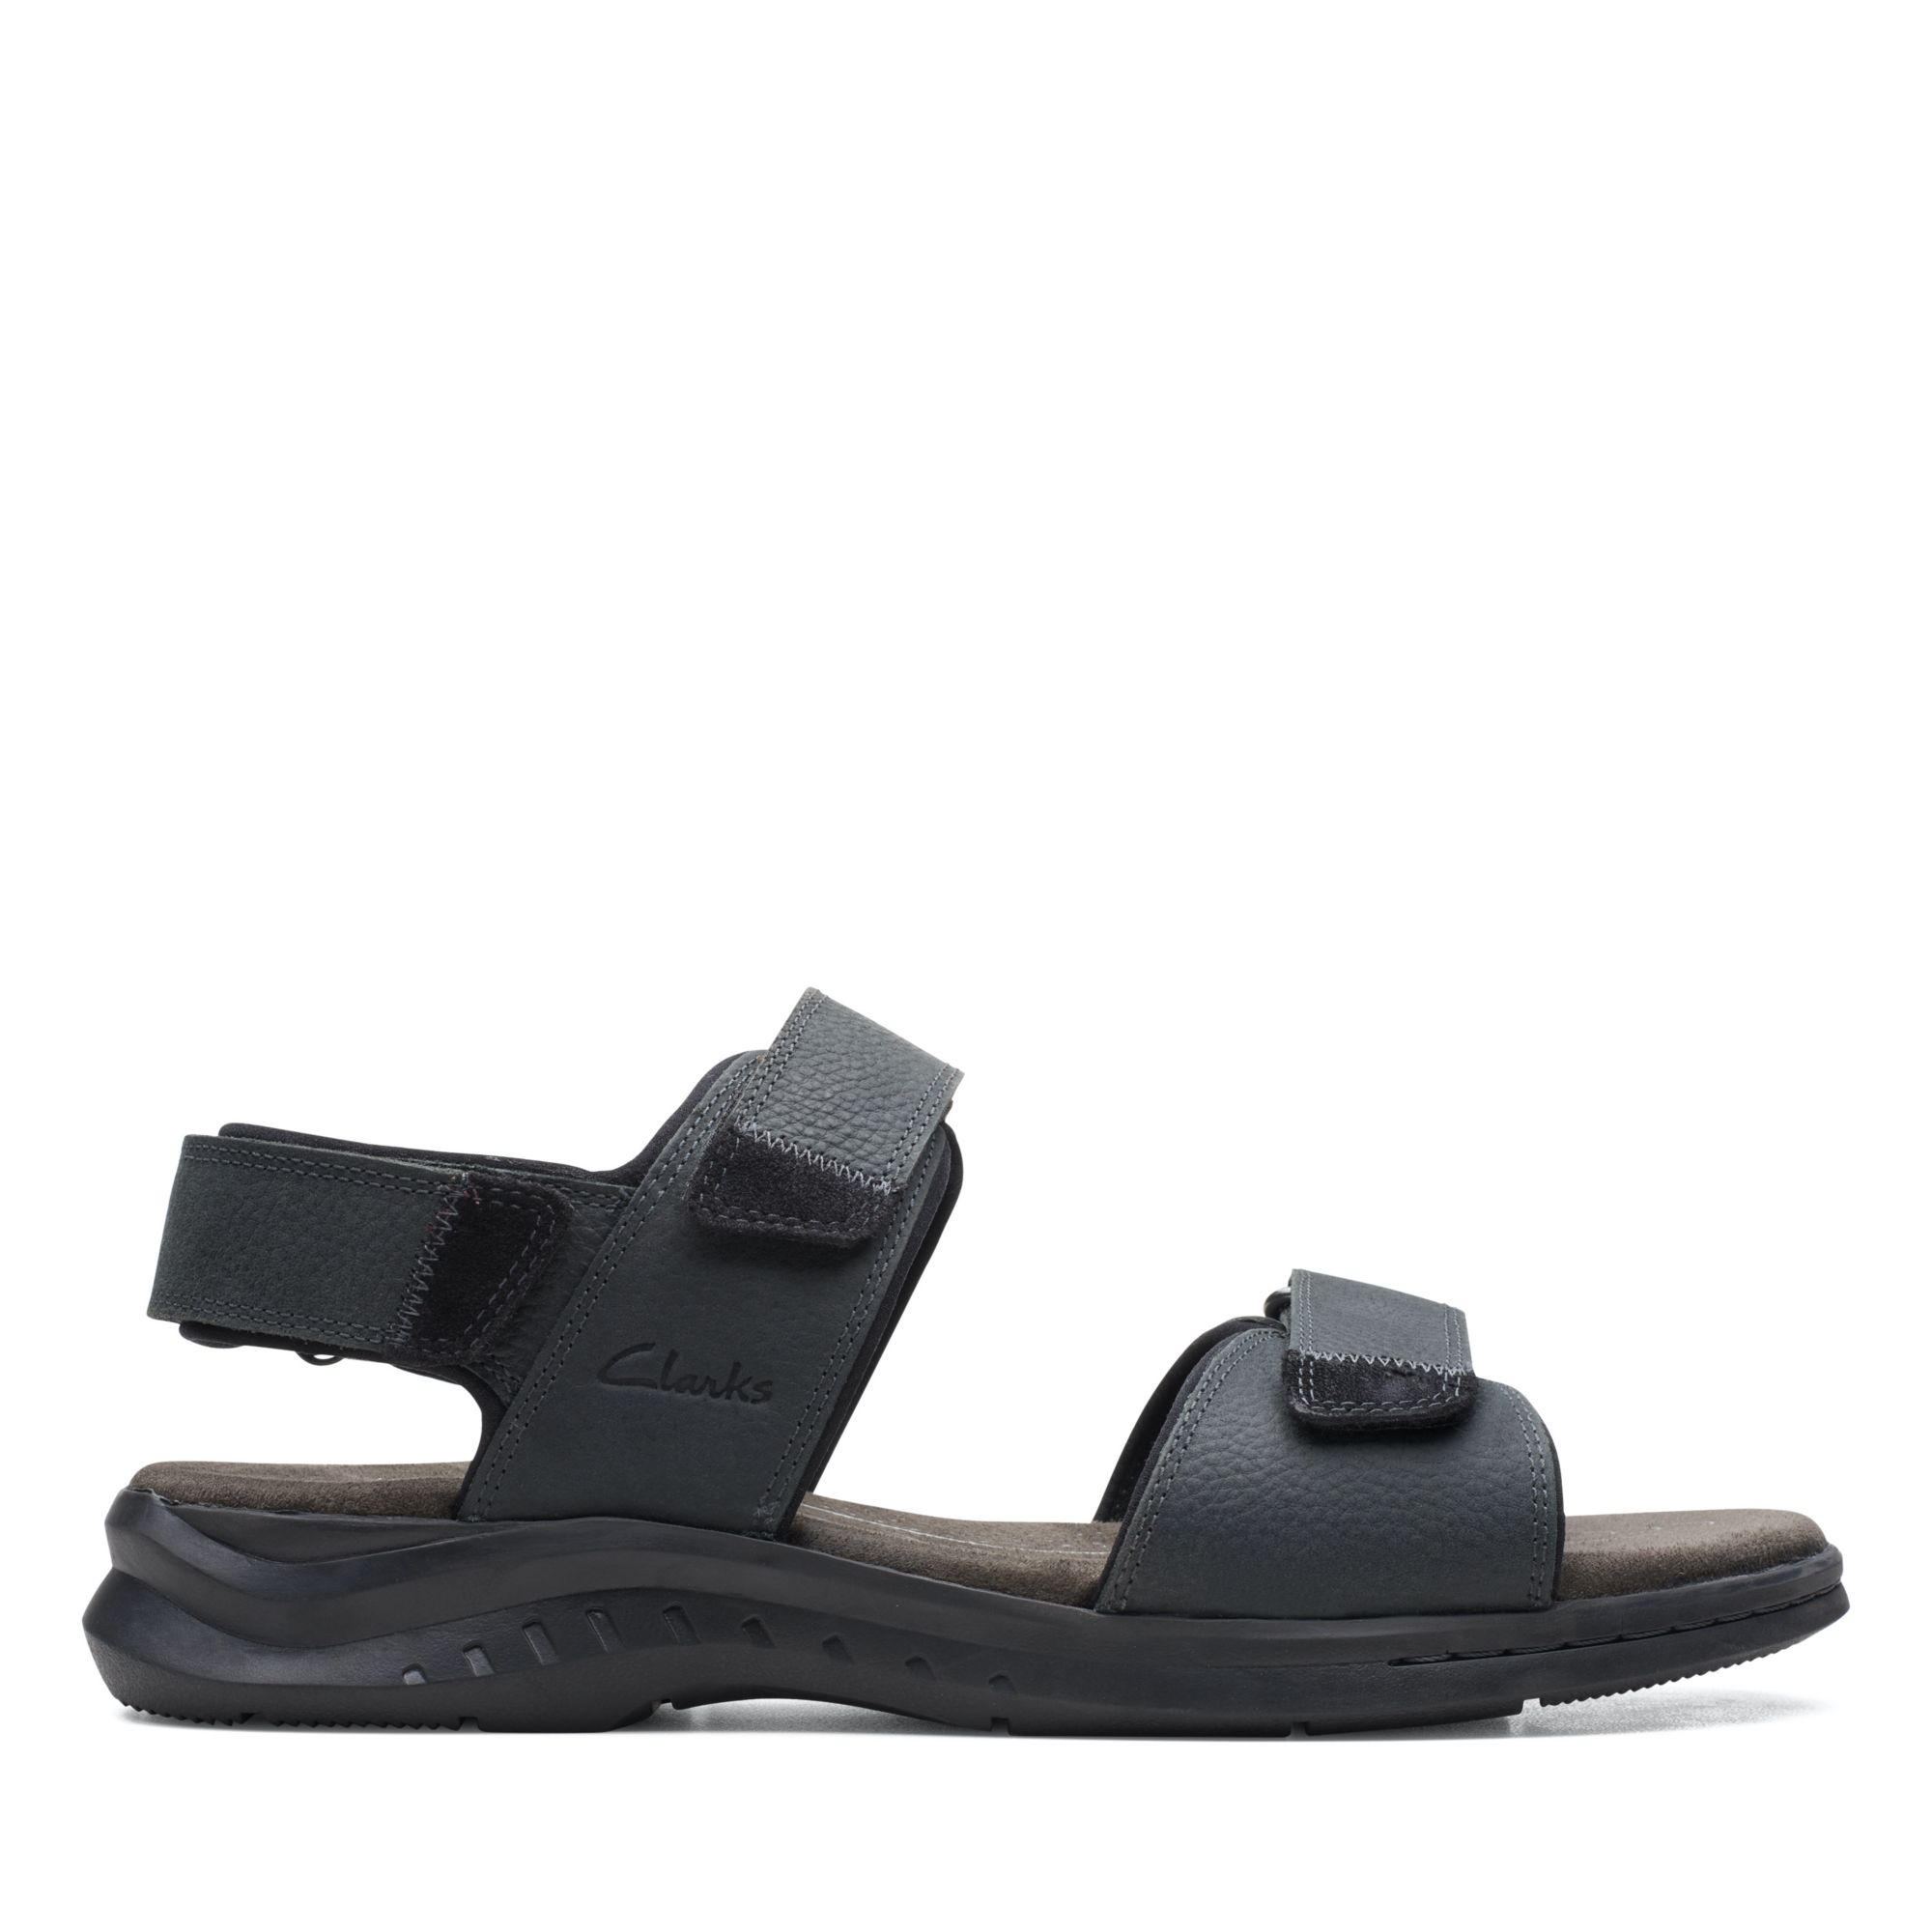 Clarks 夏日街頭-Hapsford Creek 摩鬼氈涼鞋(黑色)